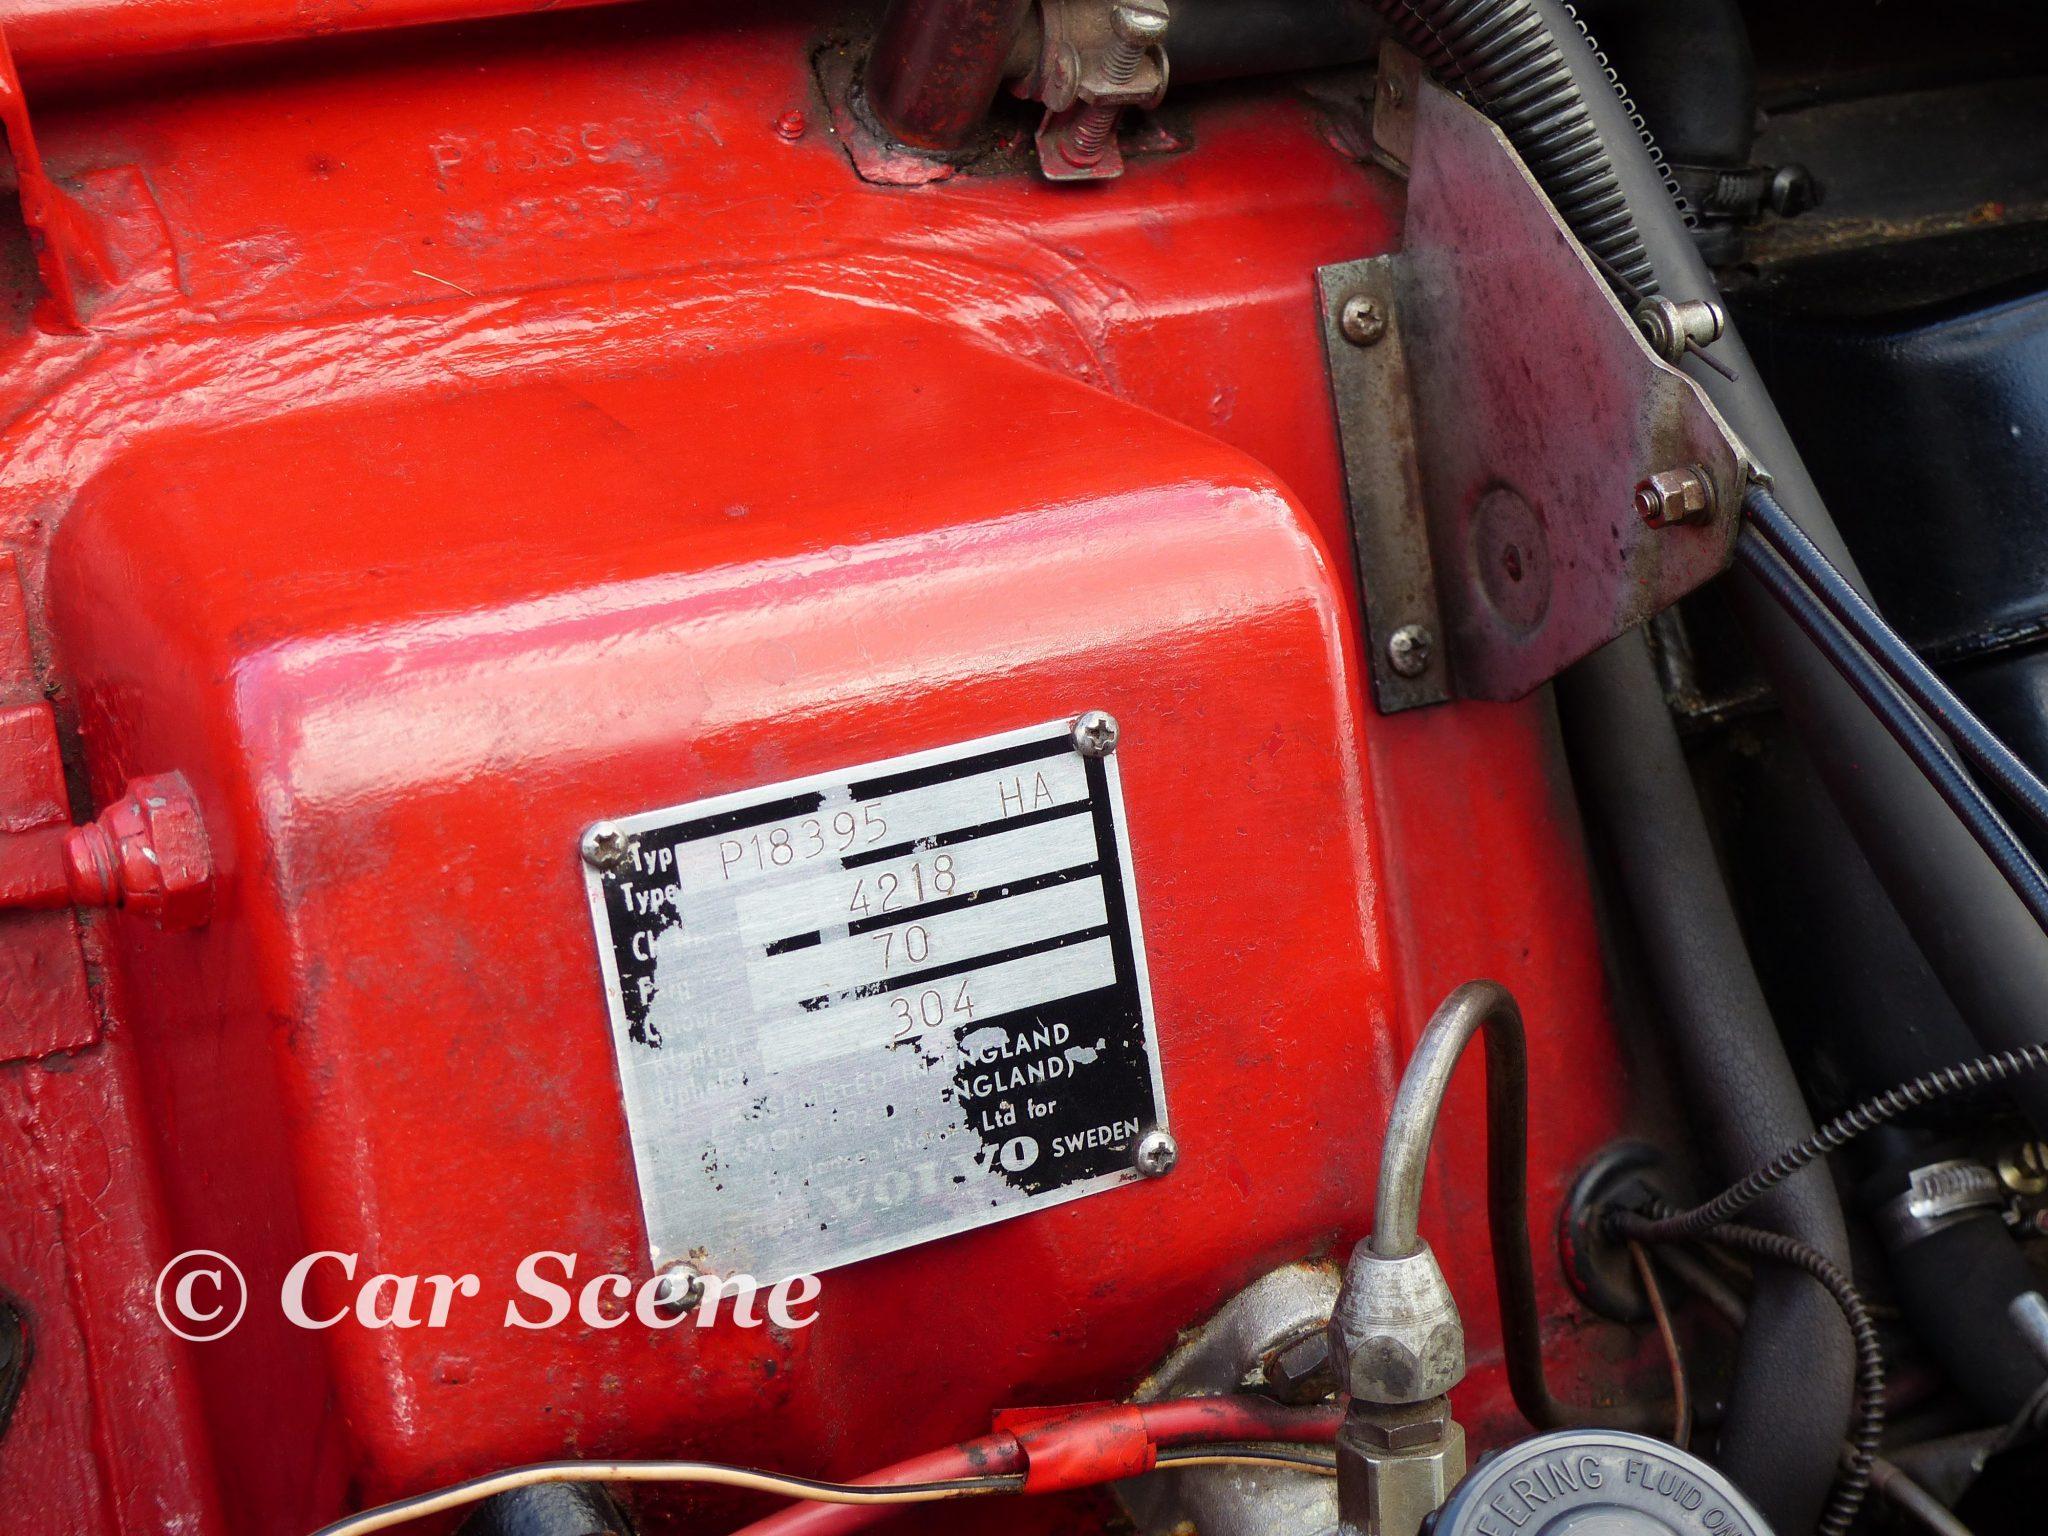 Volvo P18000 Identification Label